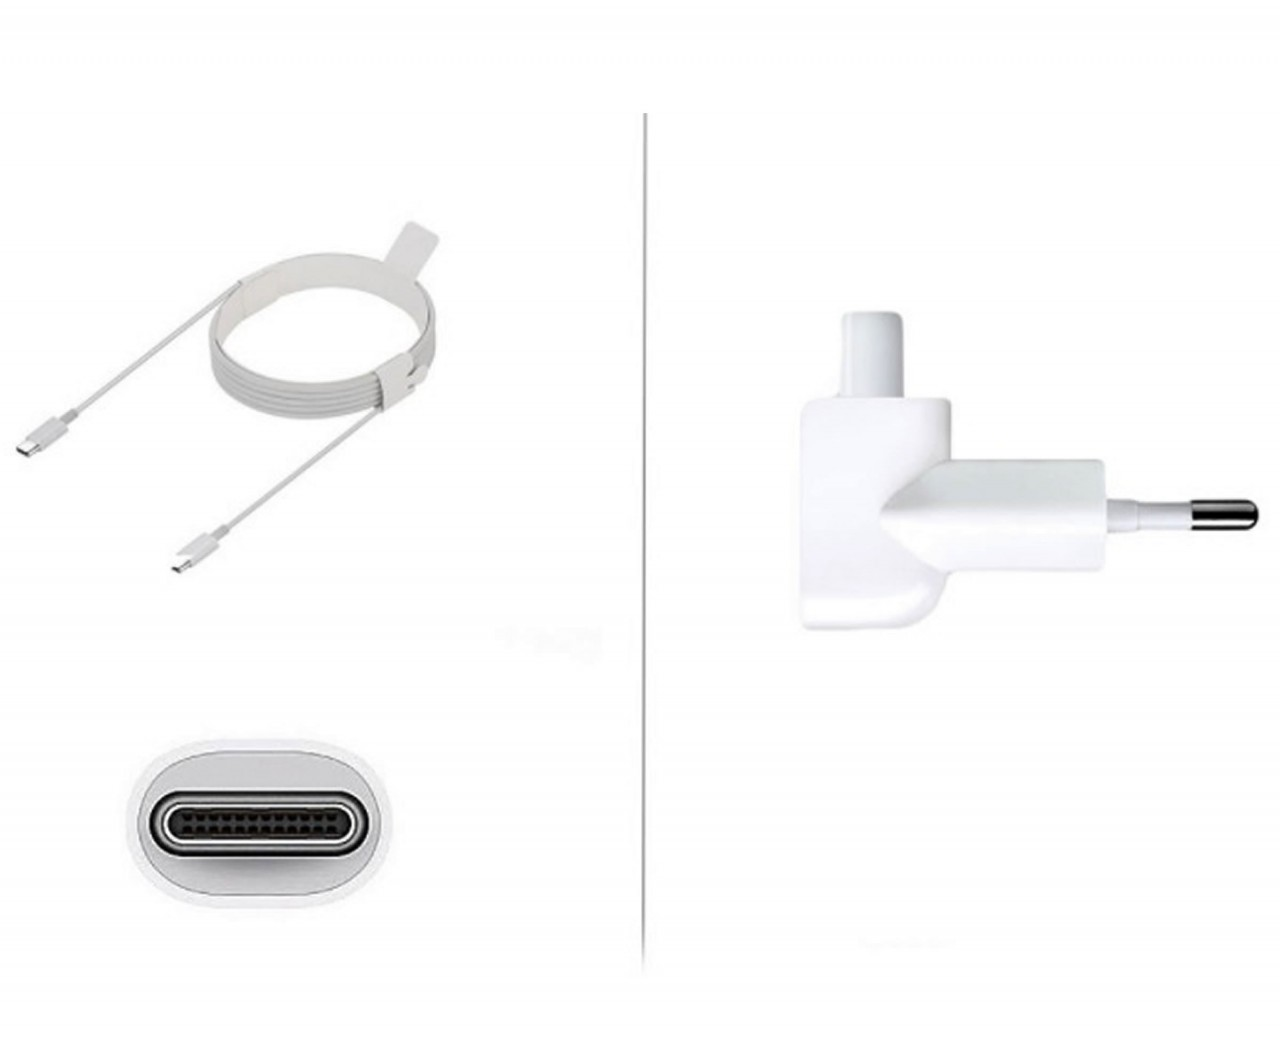 Incarcator Apple A1540 imagine powerlaptop.ro 2021